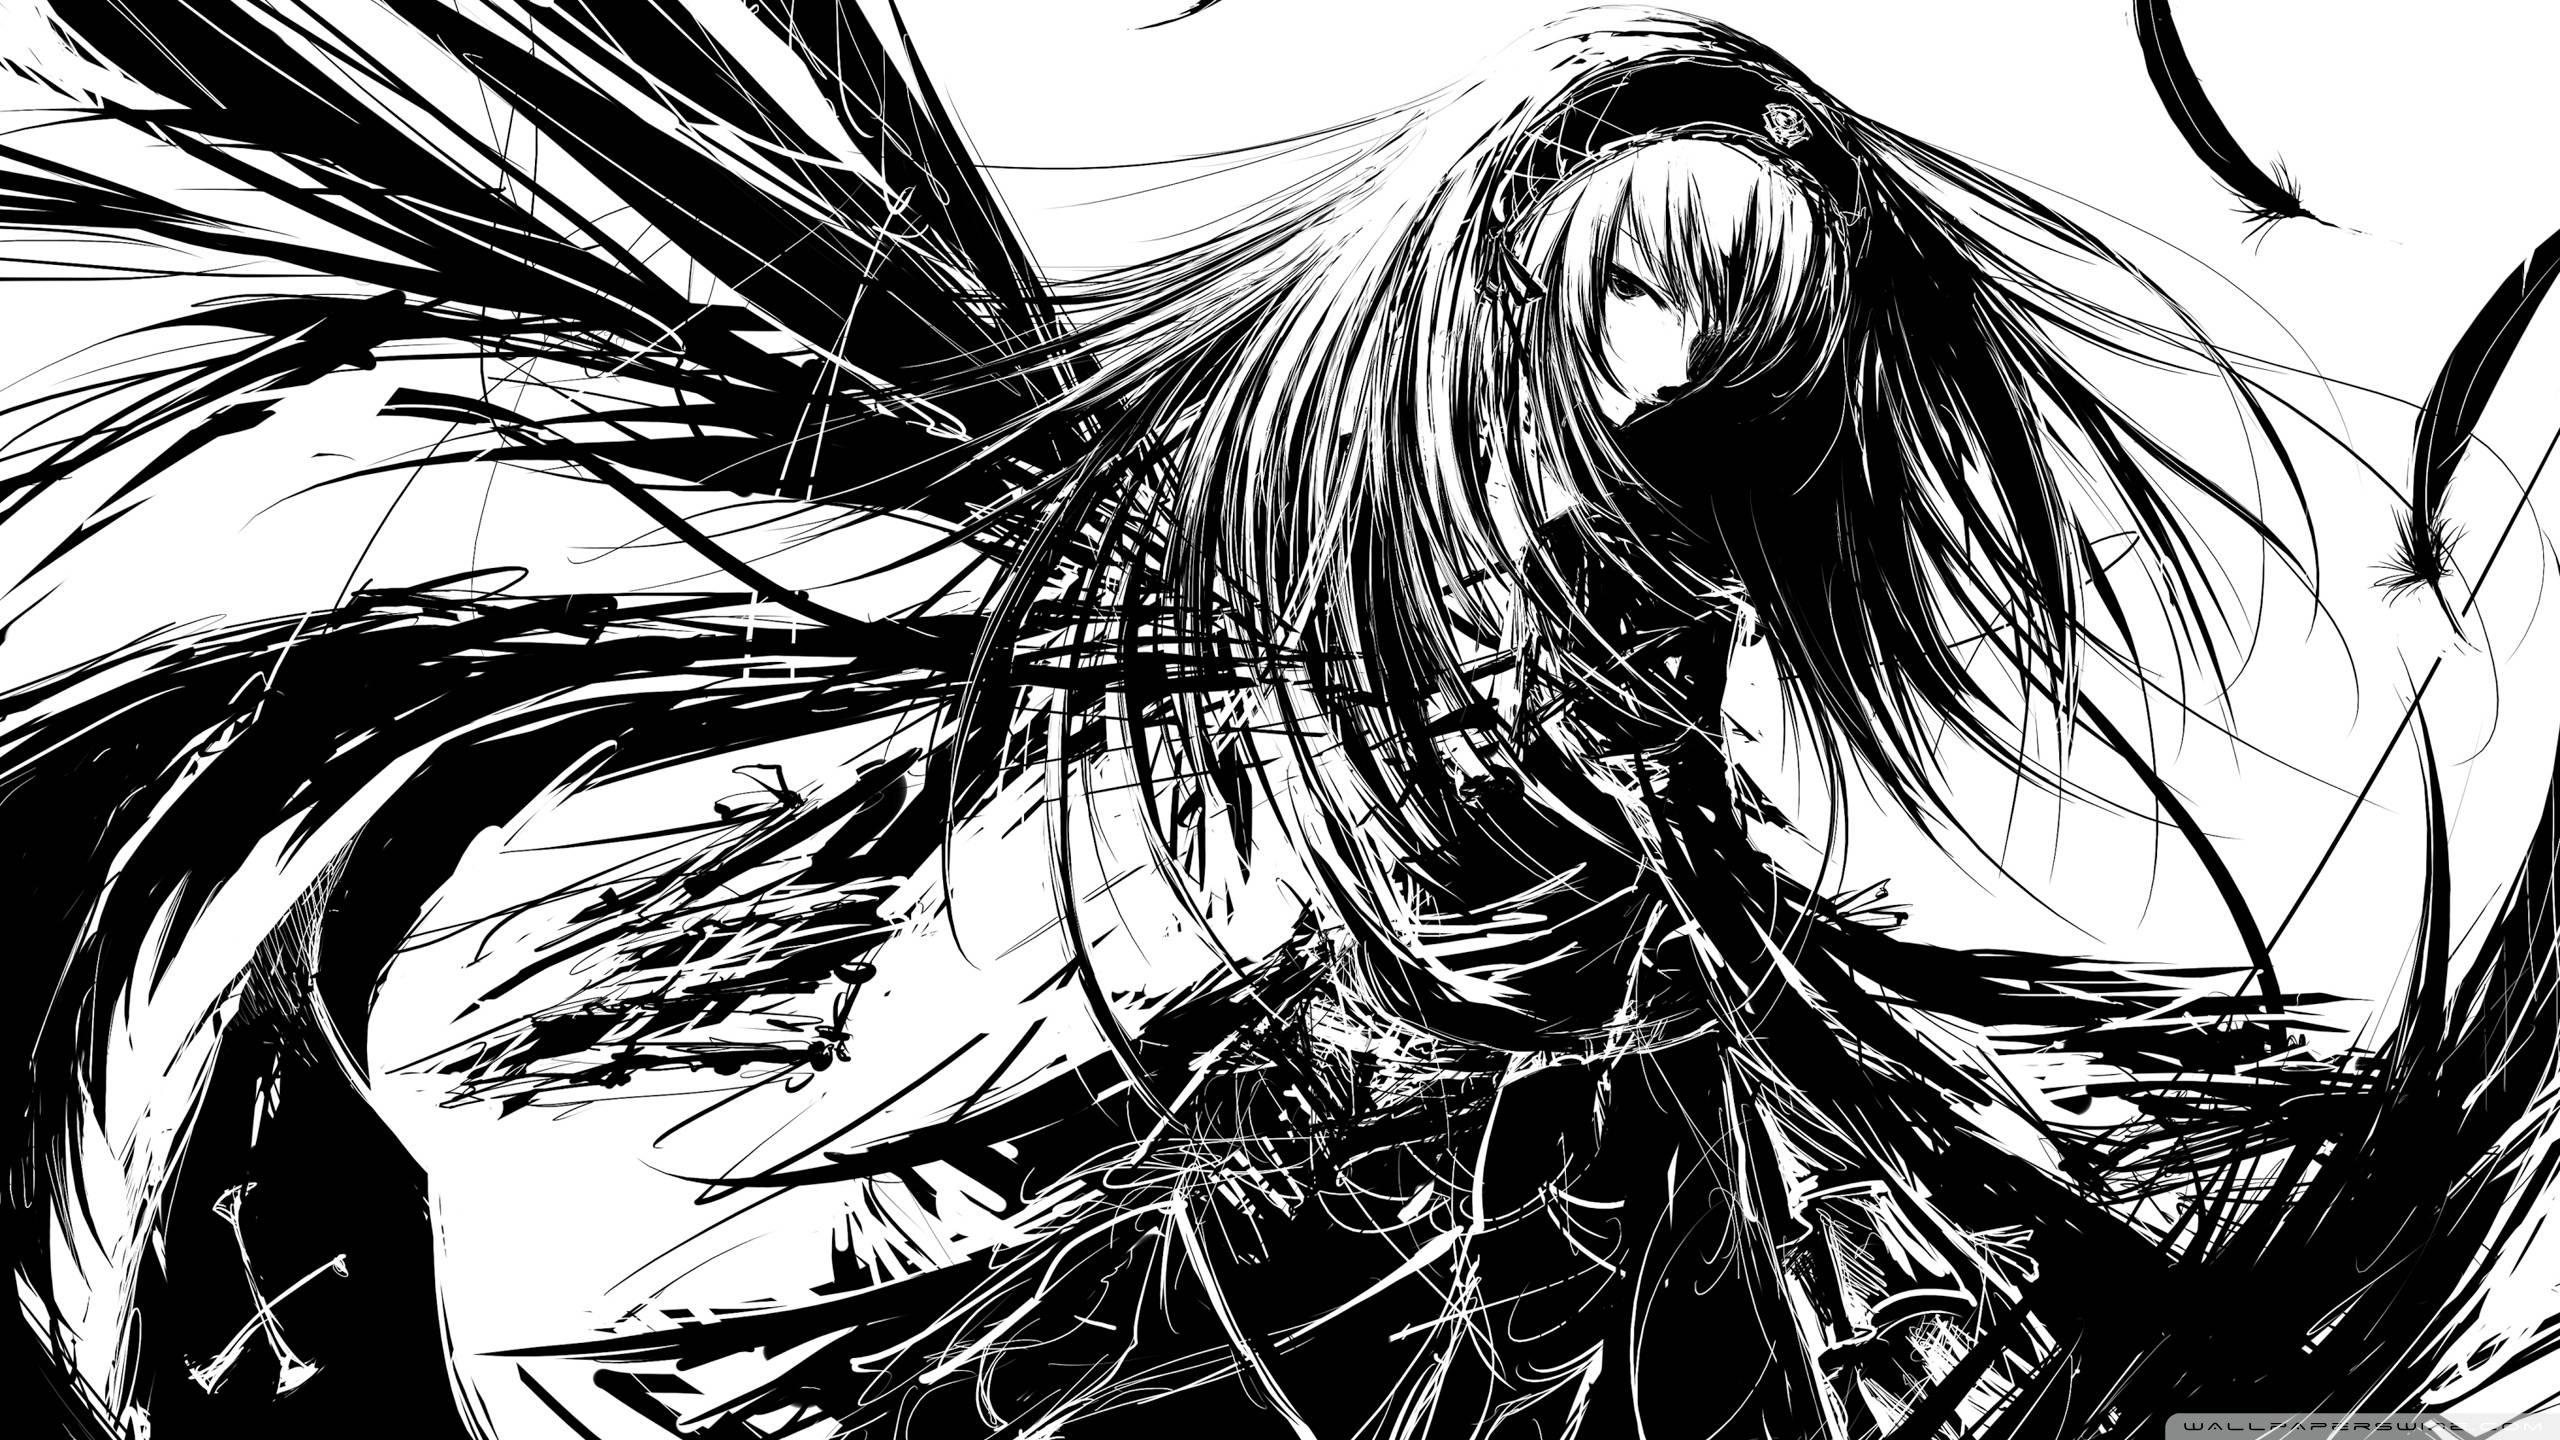 Manga Wallpapers 2560x1440